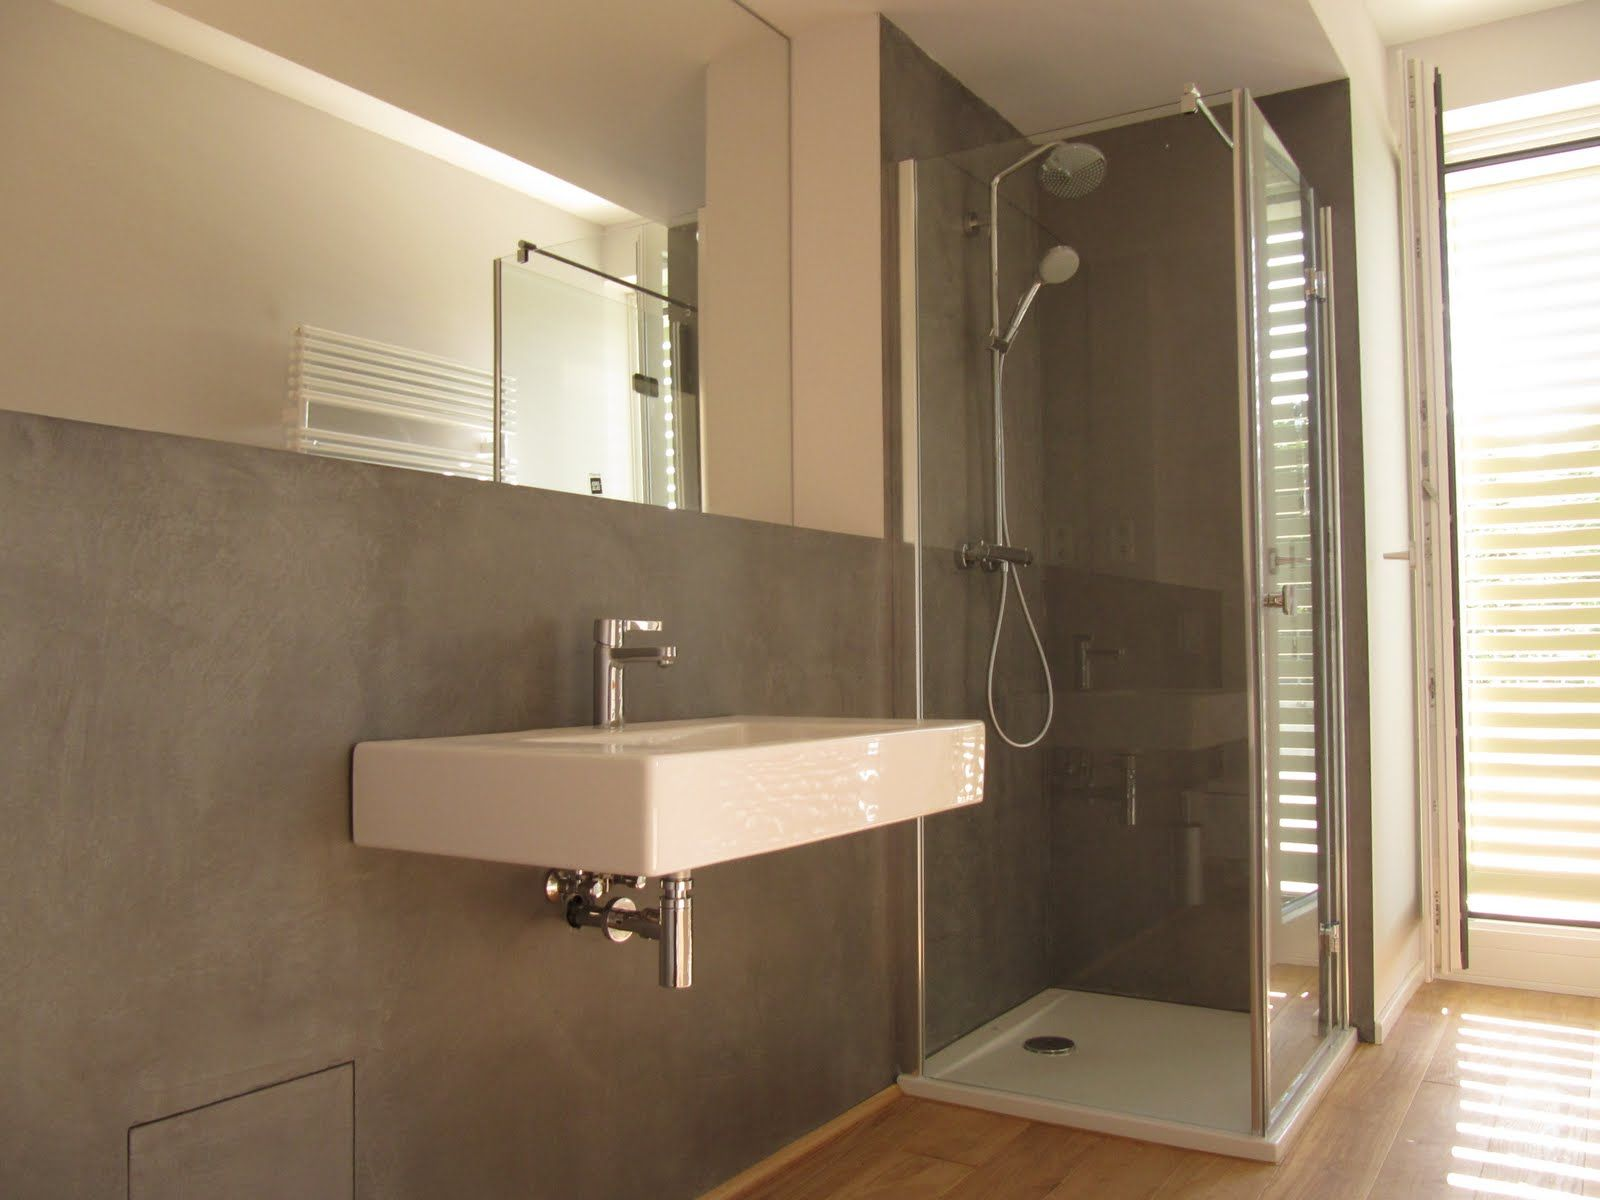 Design Handwerk Bad Betoncire Beton Cire Bad Holzfliesen Fugenloses Bad Badezimmer